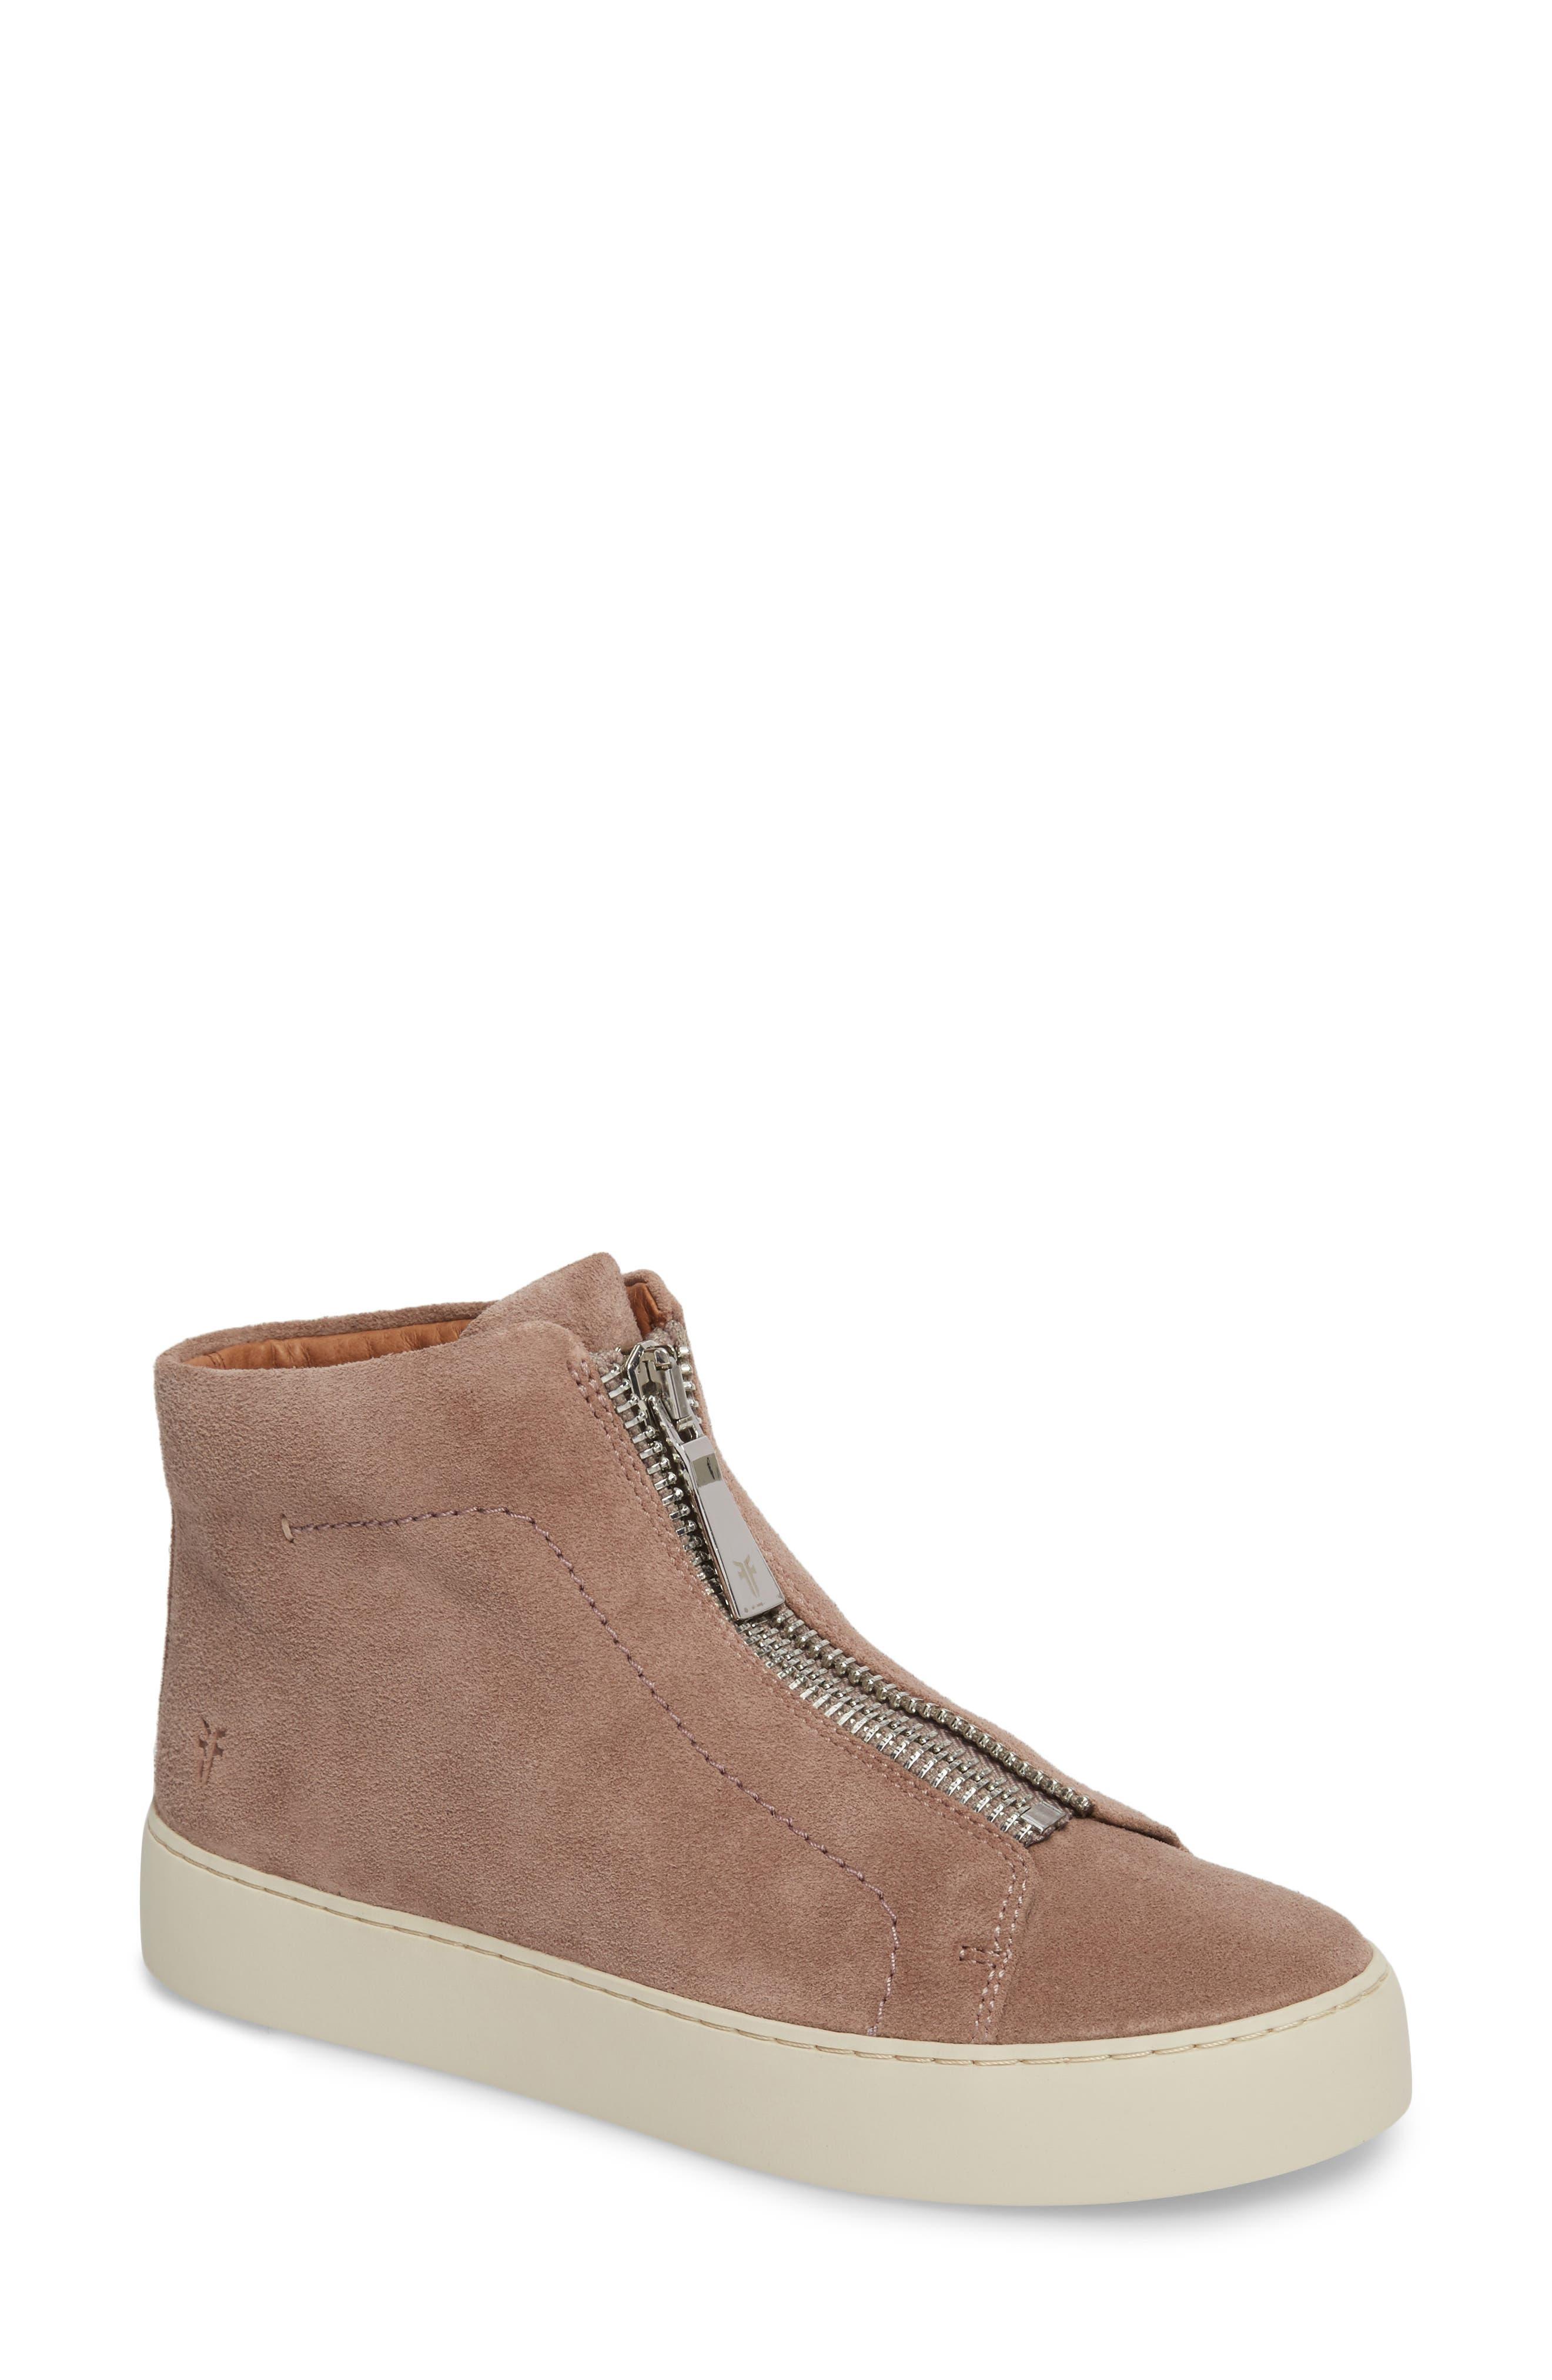 Lena Zip High Top Sneaker,                             Main thumbnail 1, color,                             Dusty Rose Suede